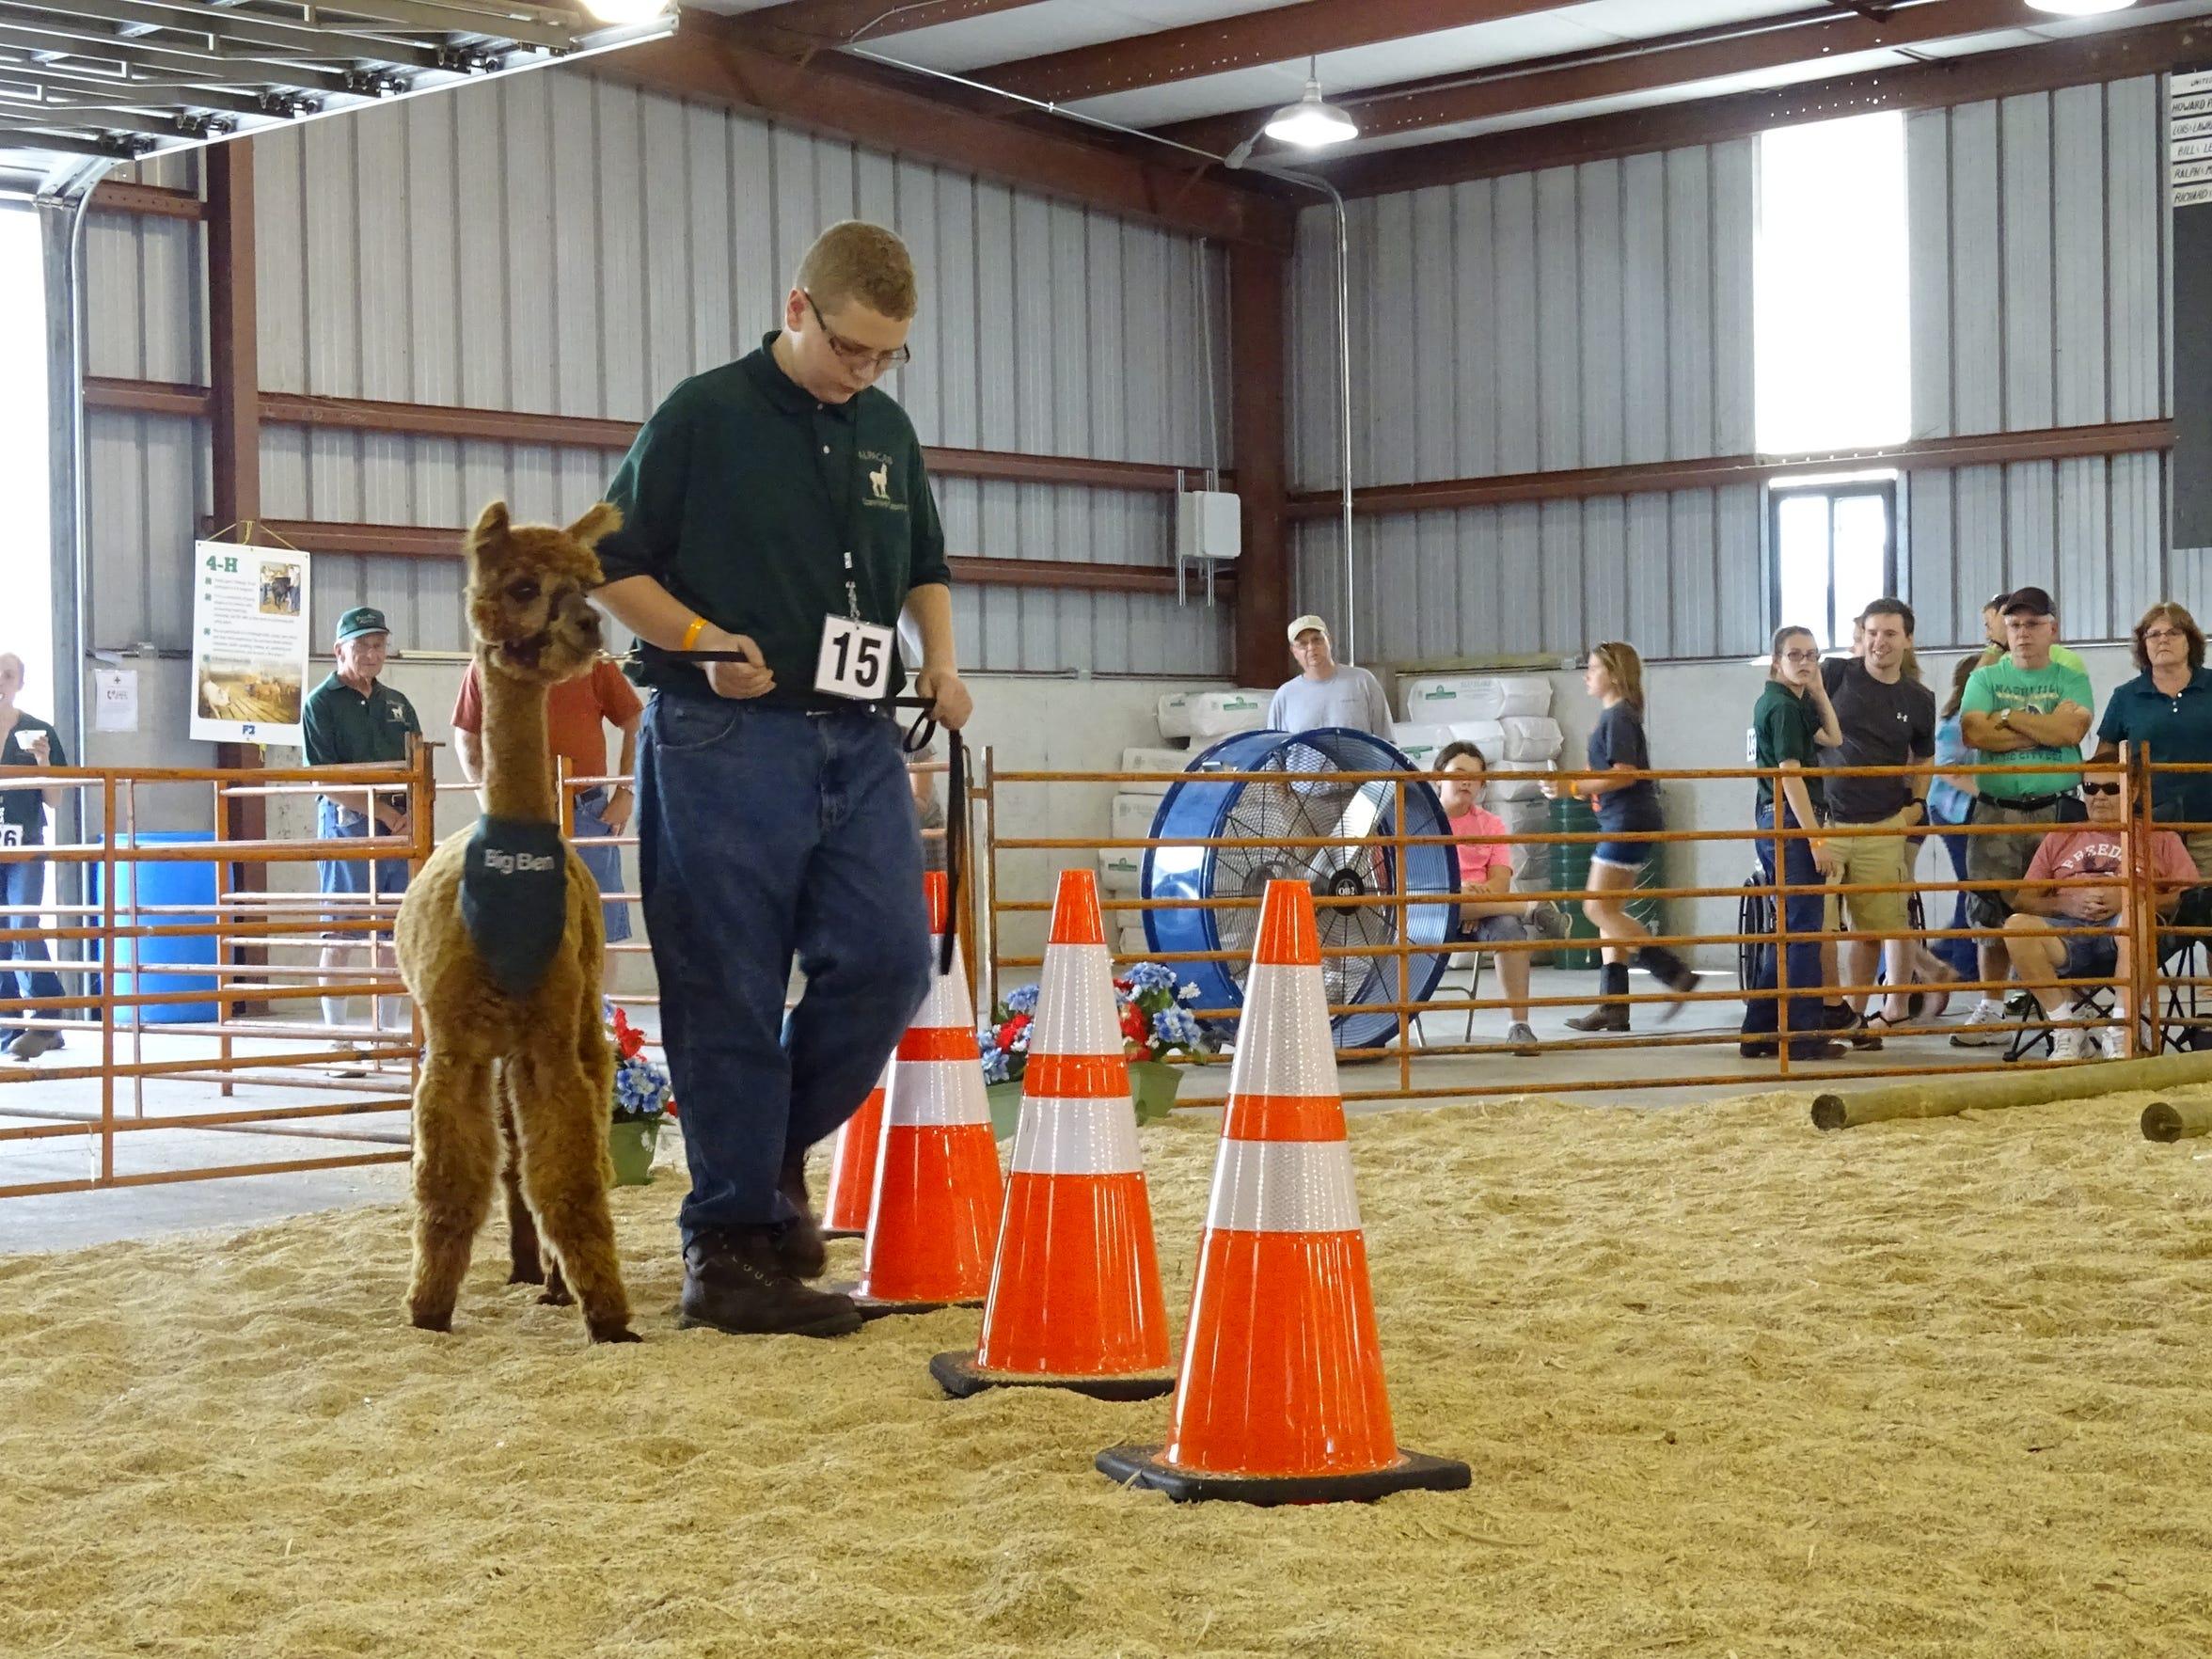 Tyler Phelps, 15, leads his alpaca around a few traffic